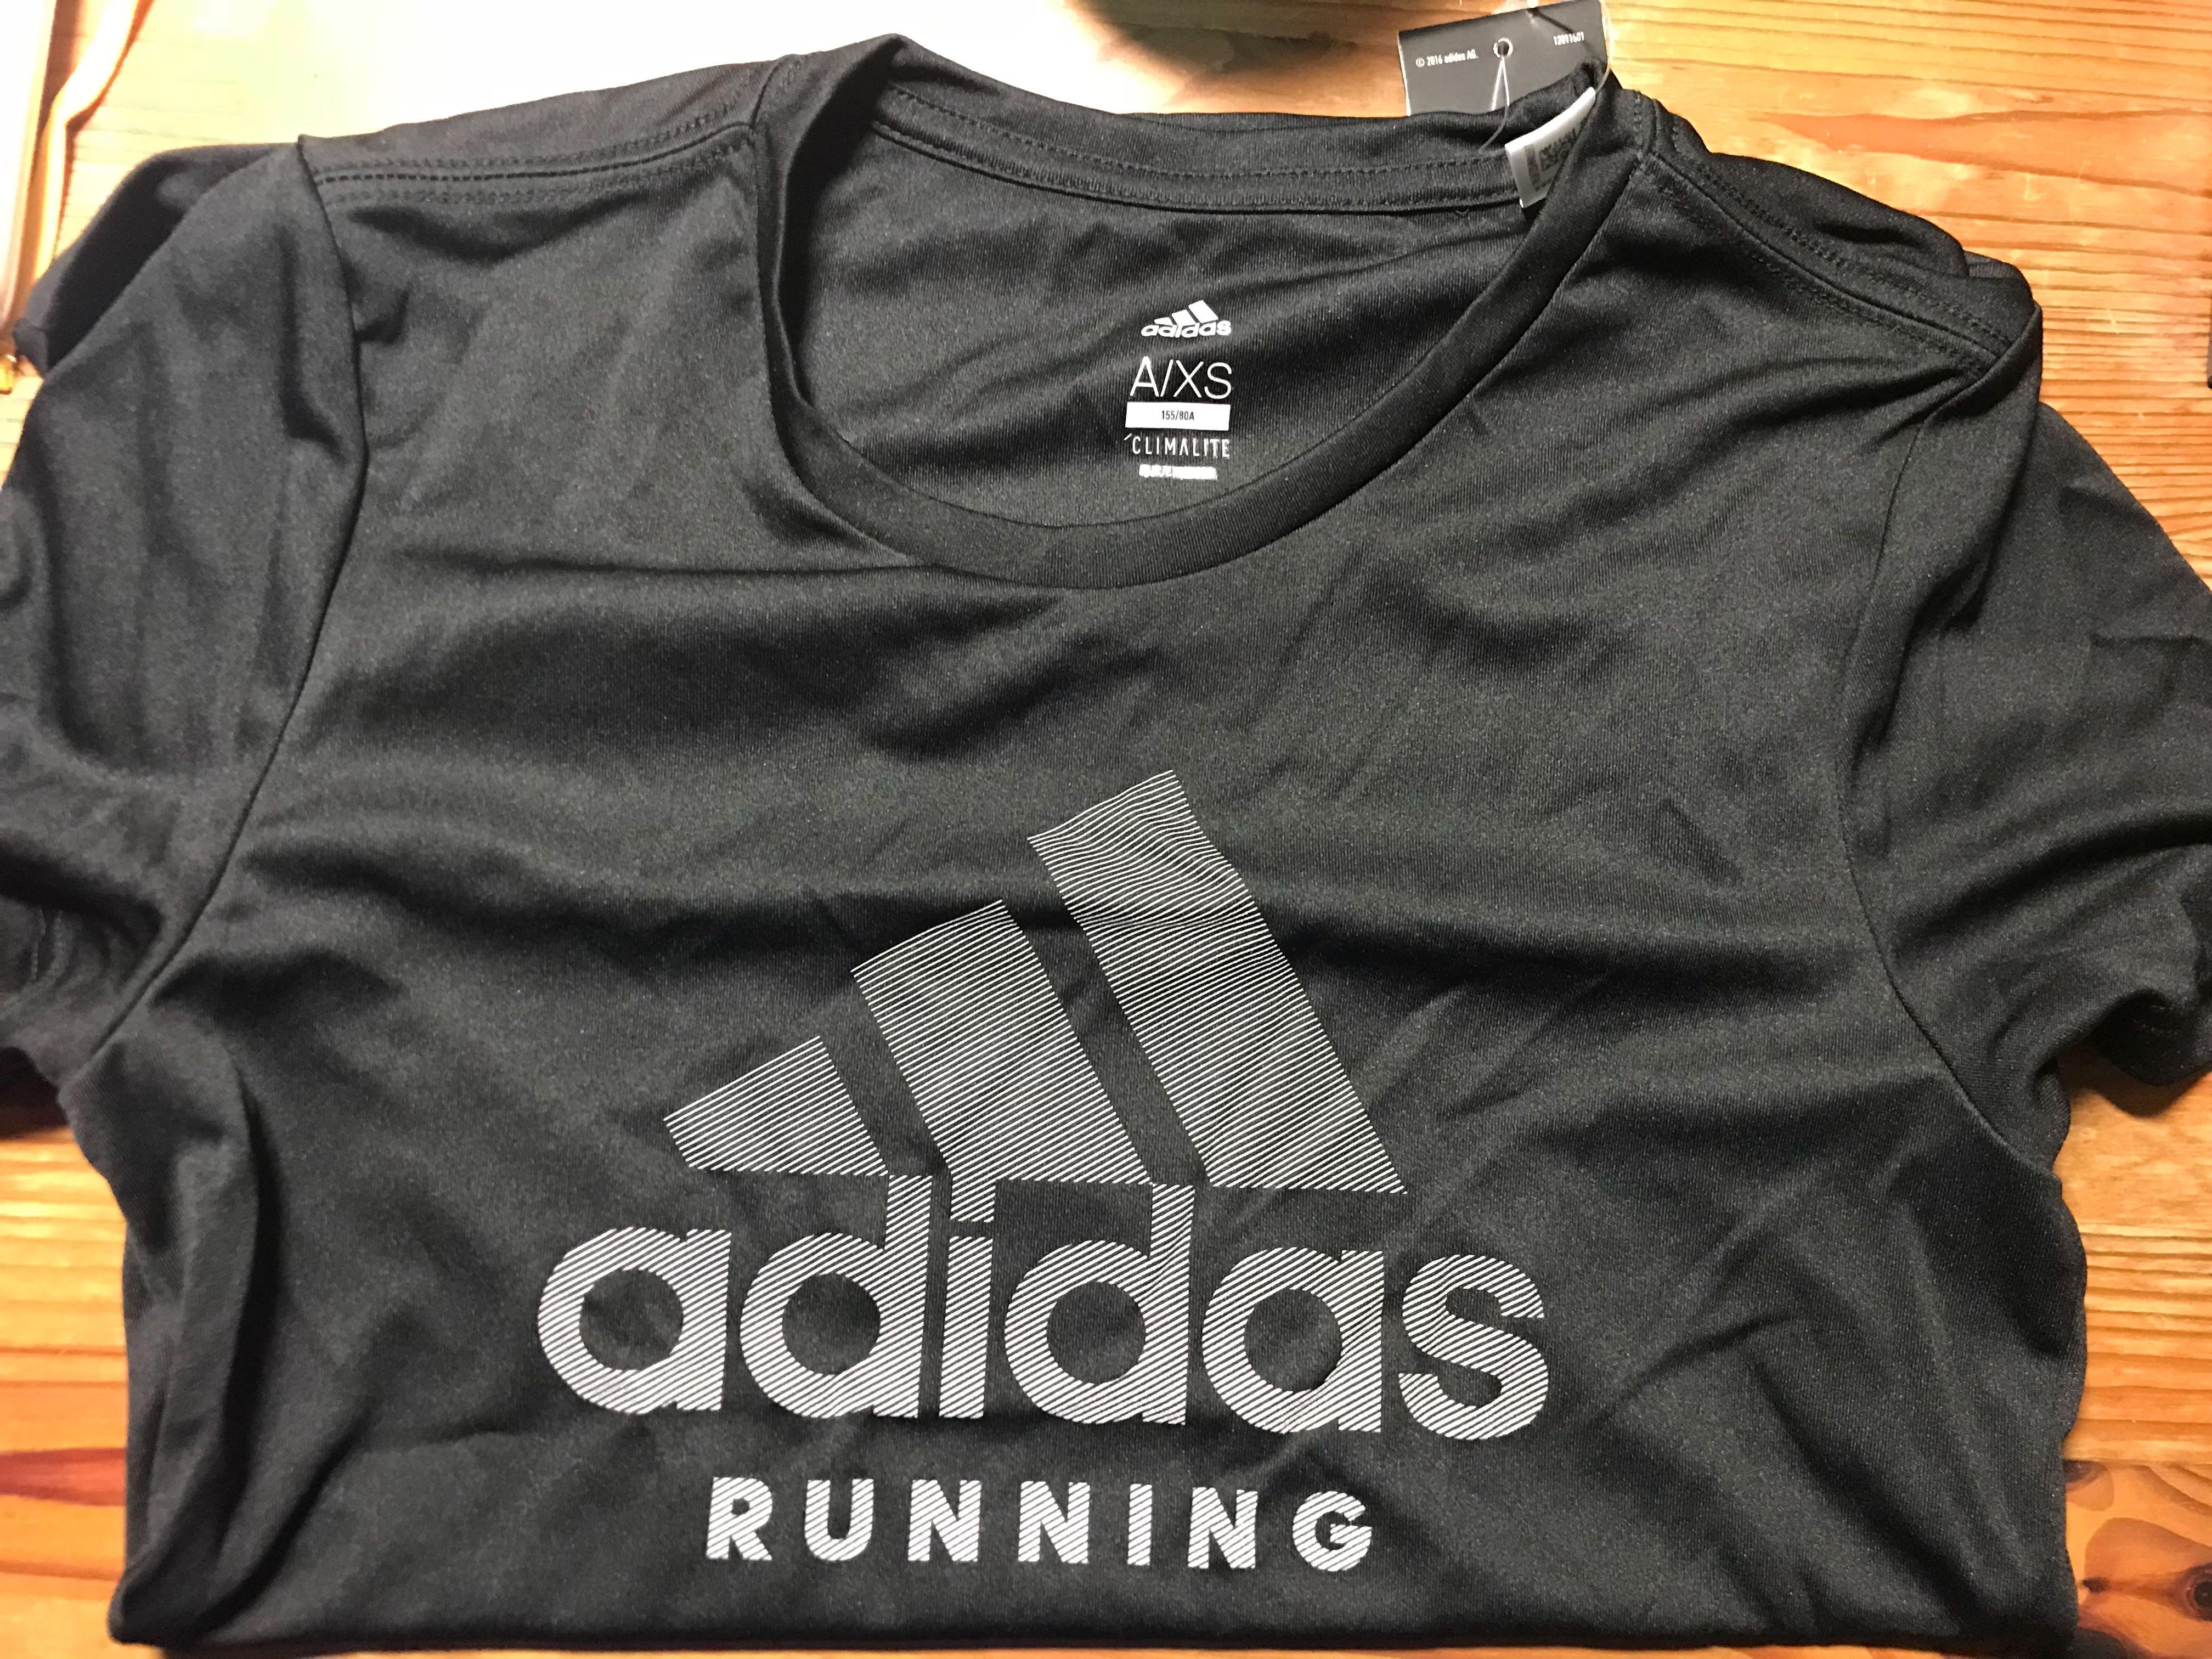 bffa71e52967 Adidas Dri Fit Running Shirt